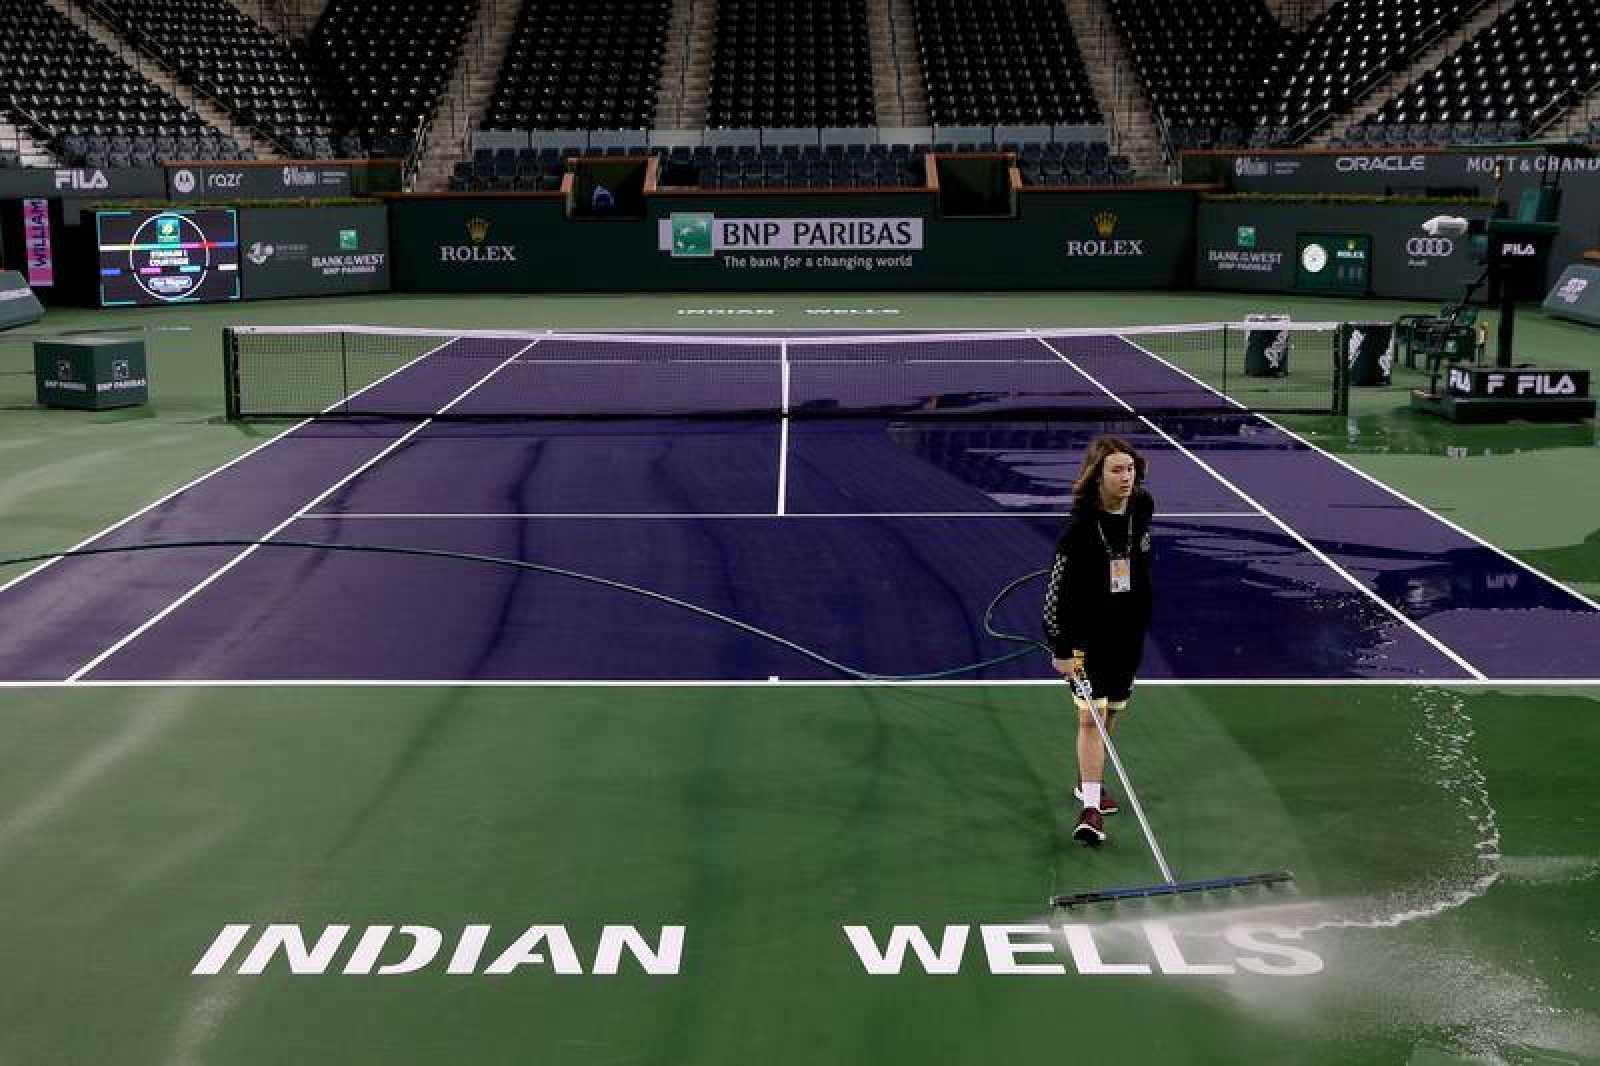 Tareas de limpieza de una pista en Indian Wells